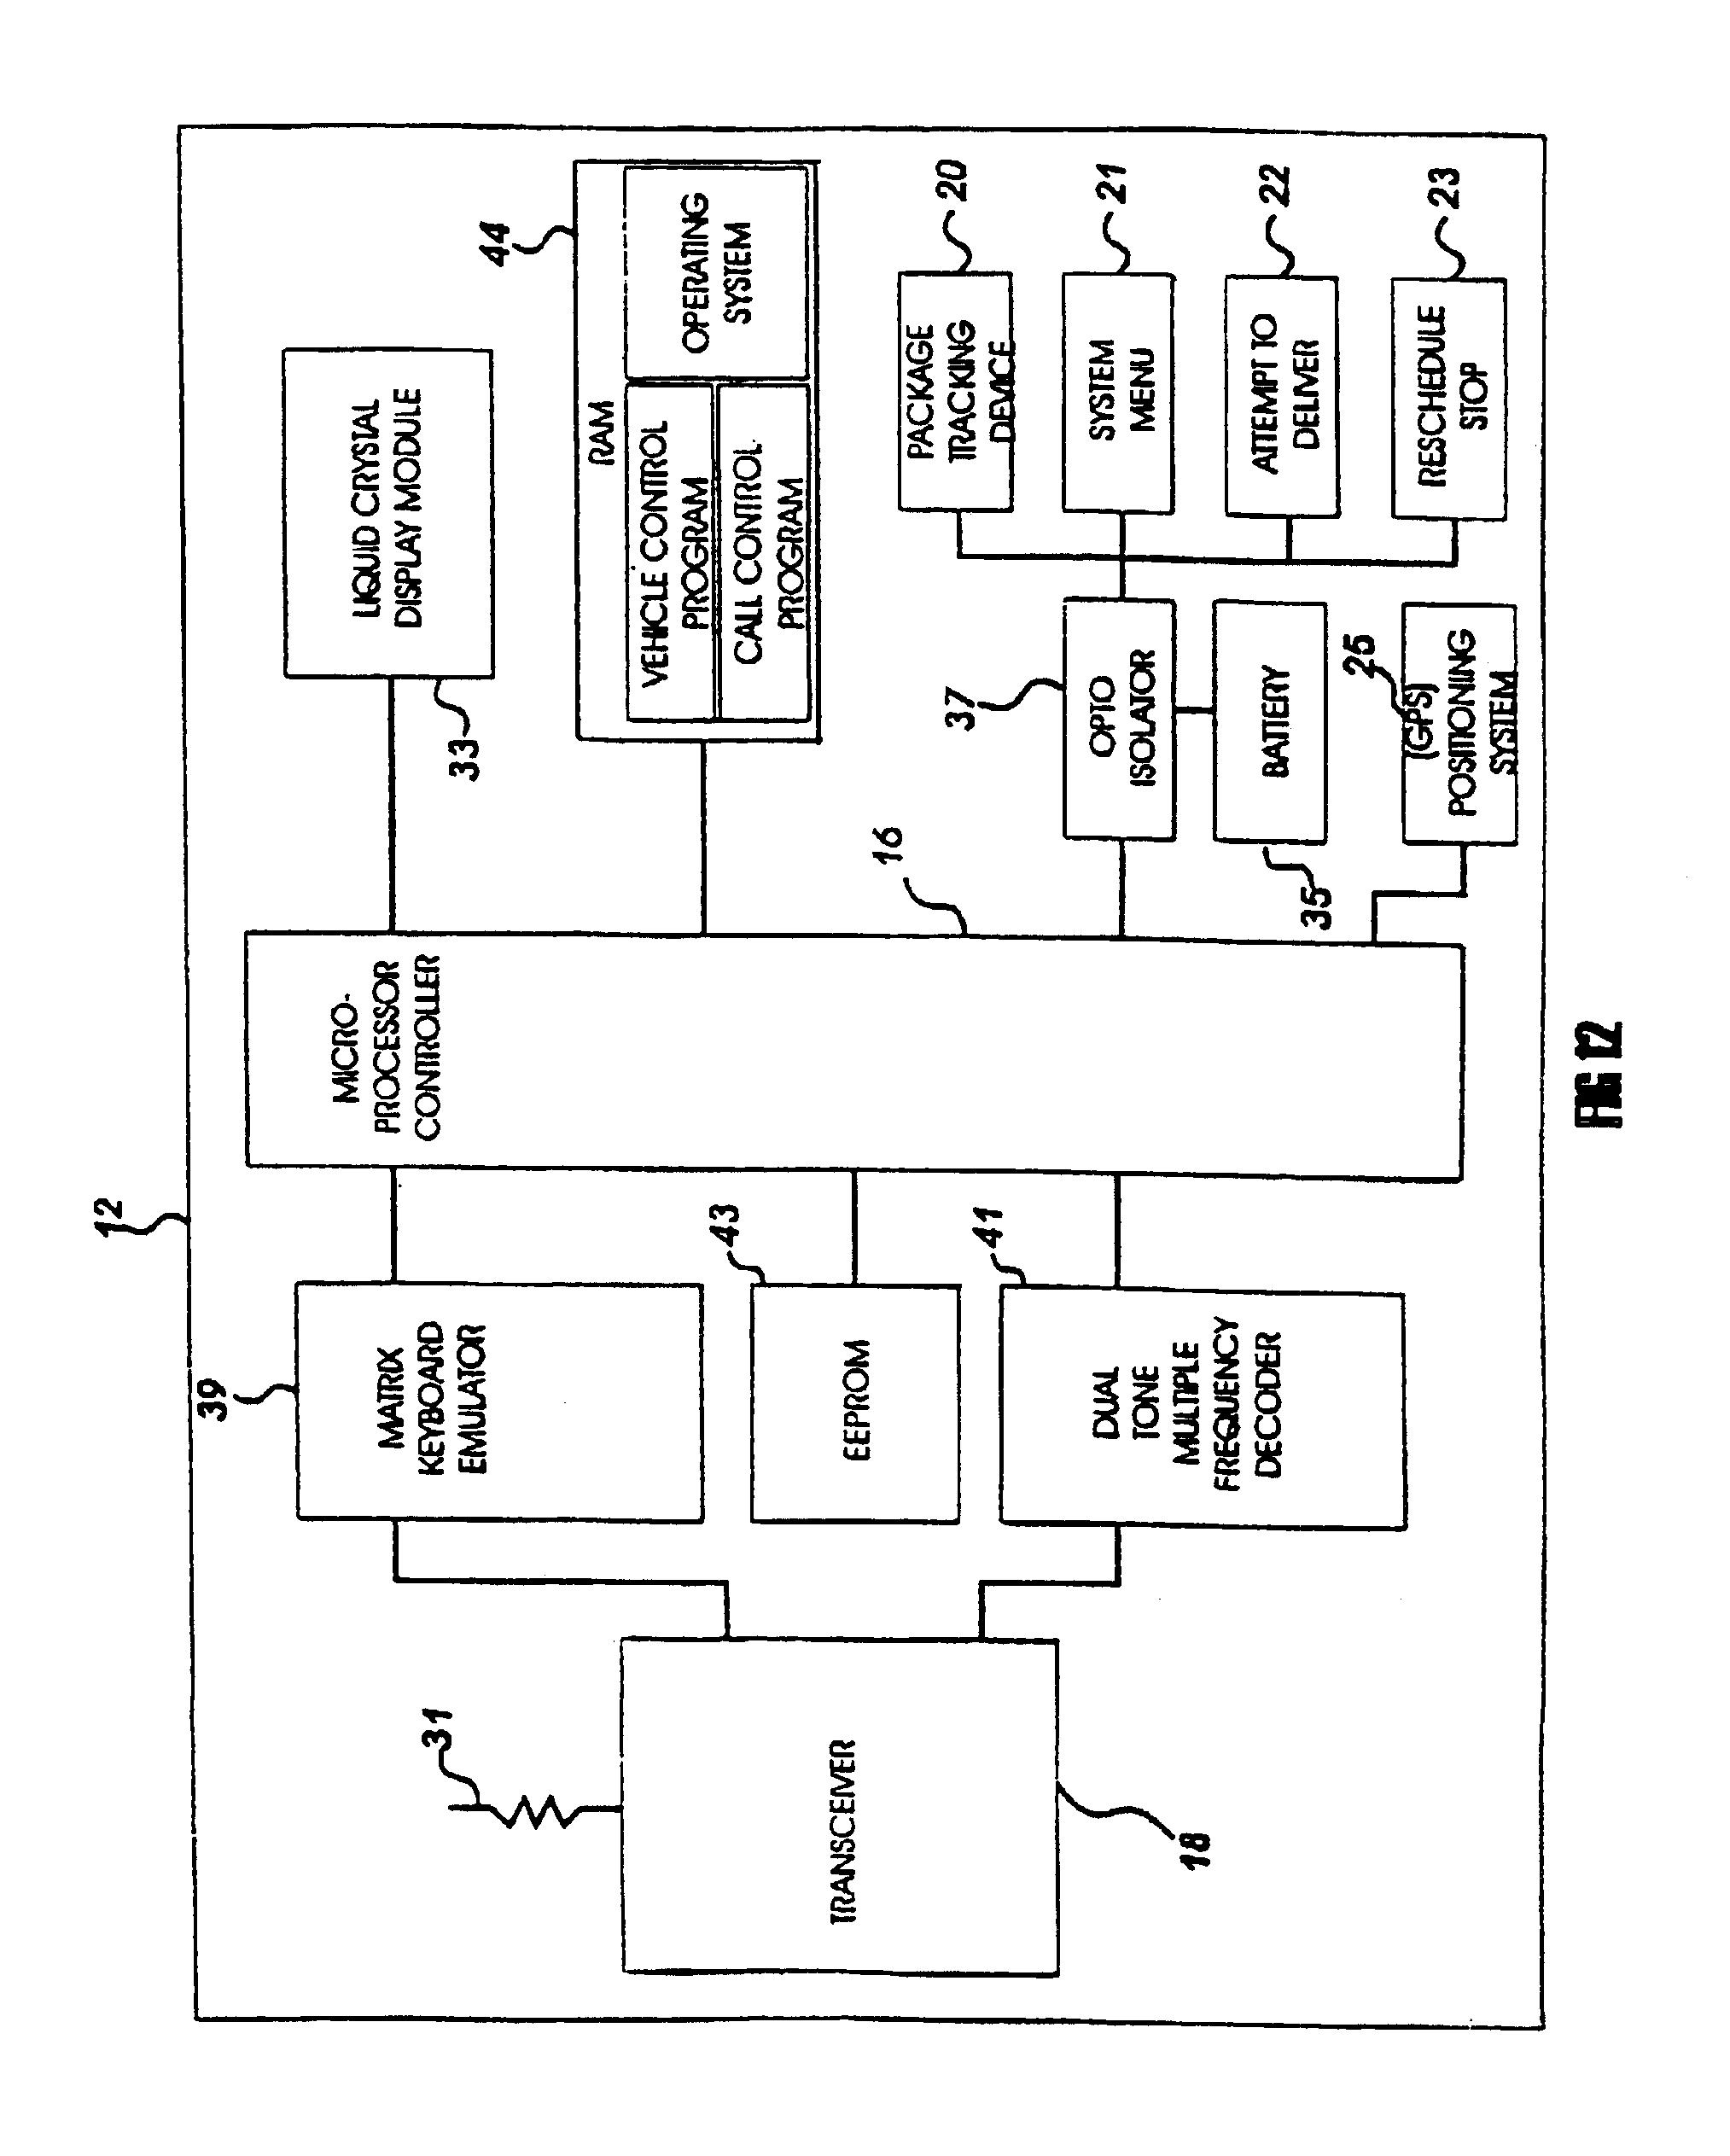 Patent US 6,904,359 B2